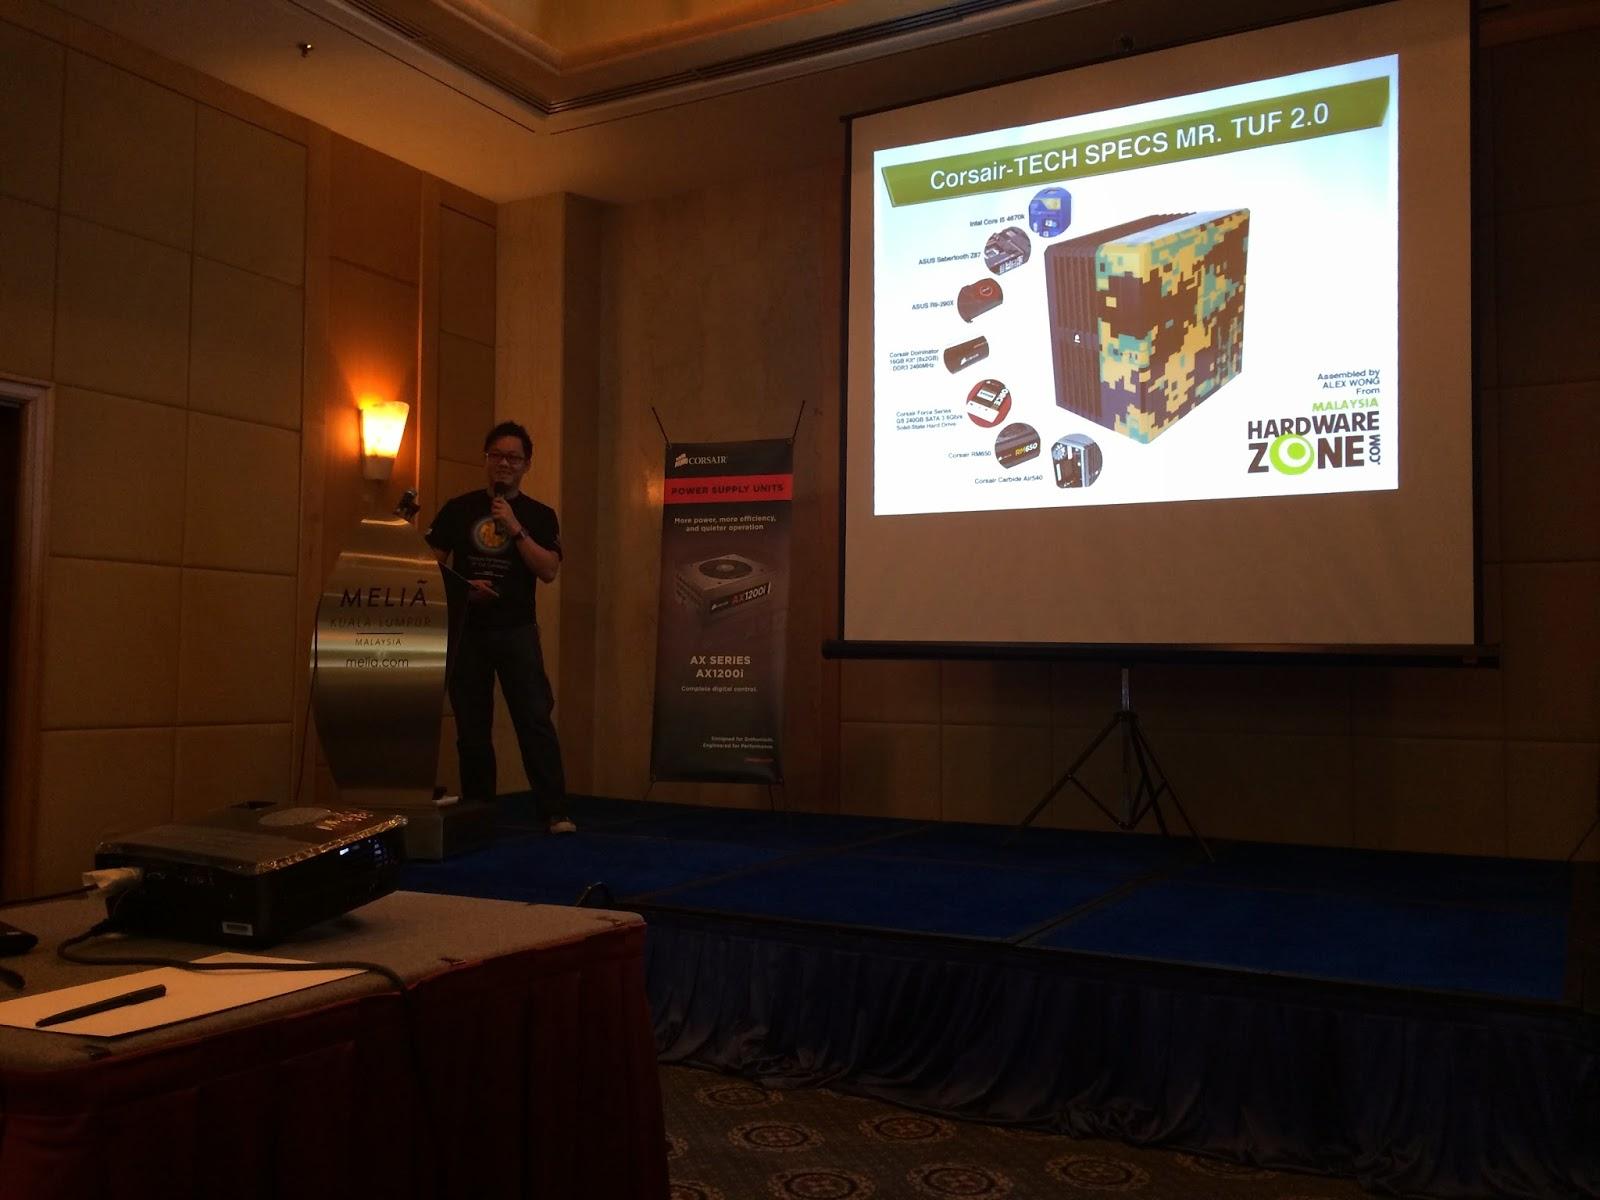 Coverage of Corsair Event @Melia Kuala Lumpur 81